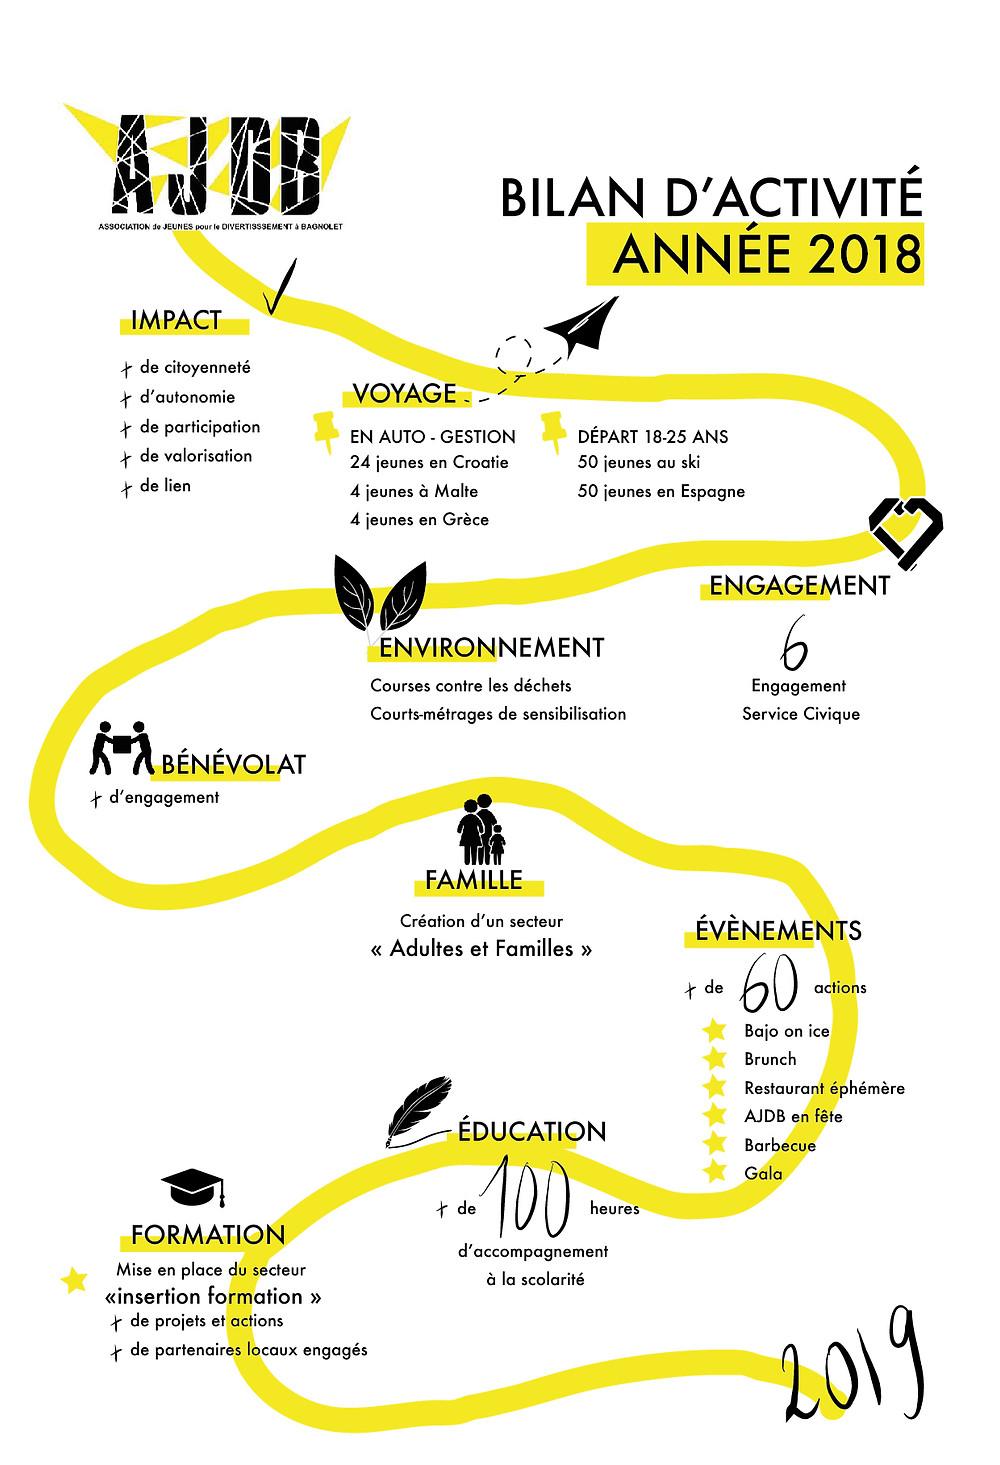 ajdb bilan activité 2018 studio nanana